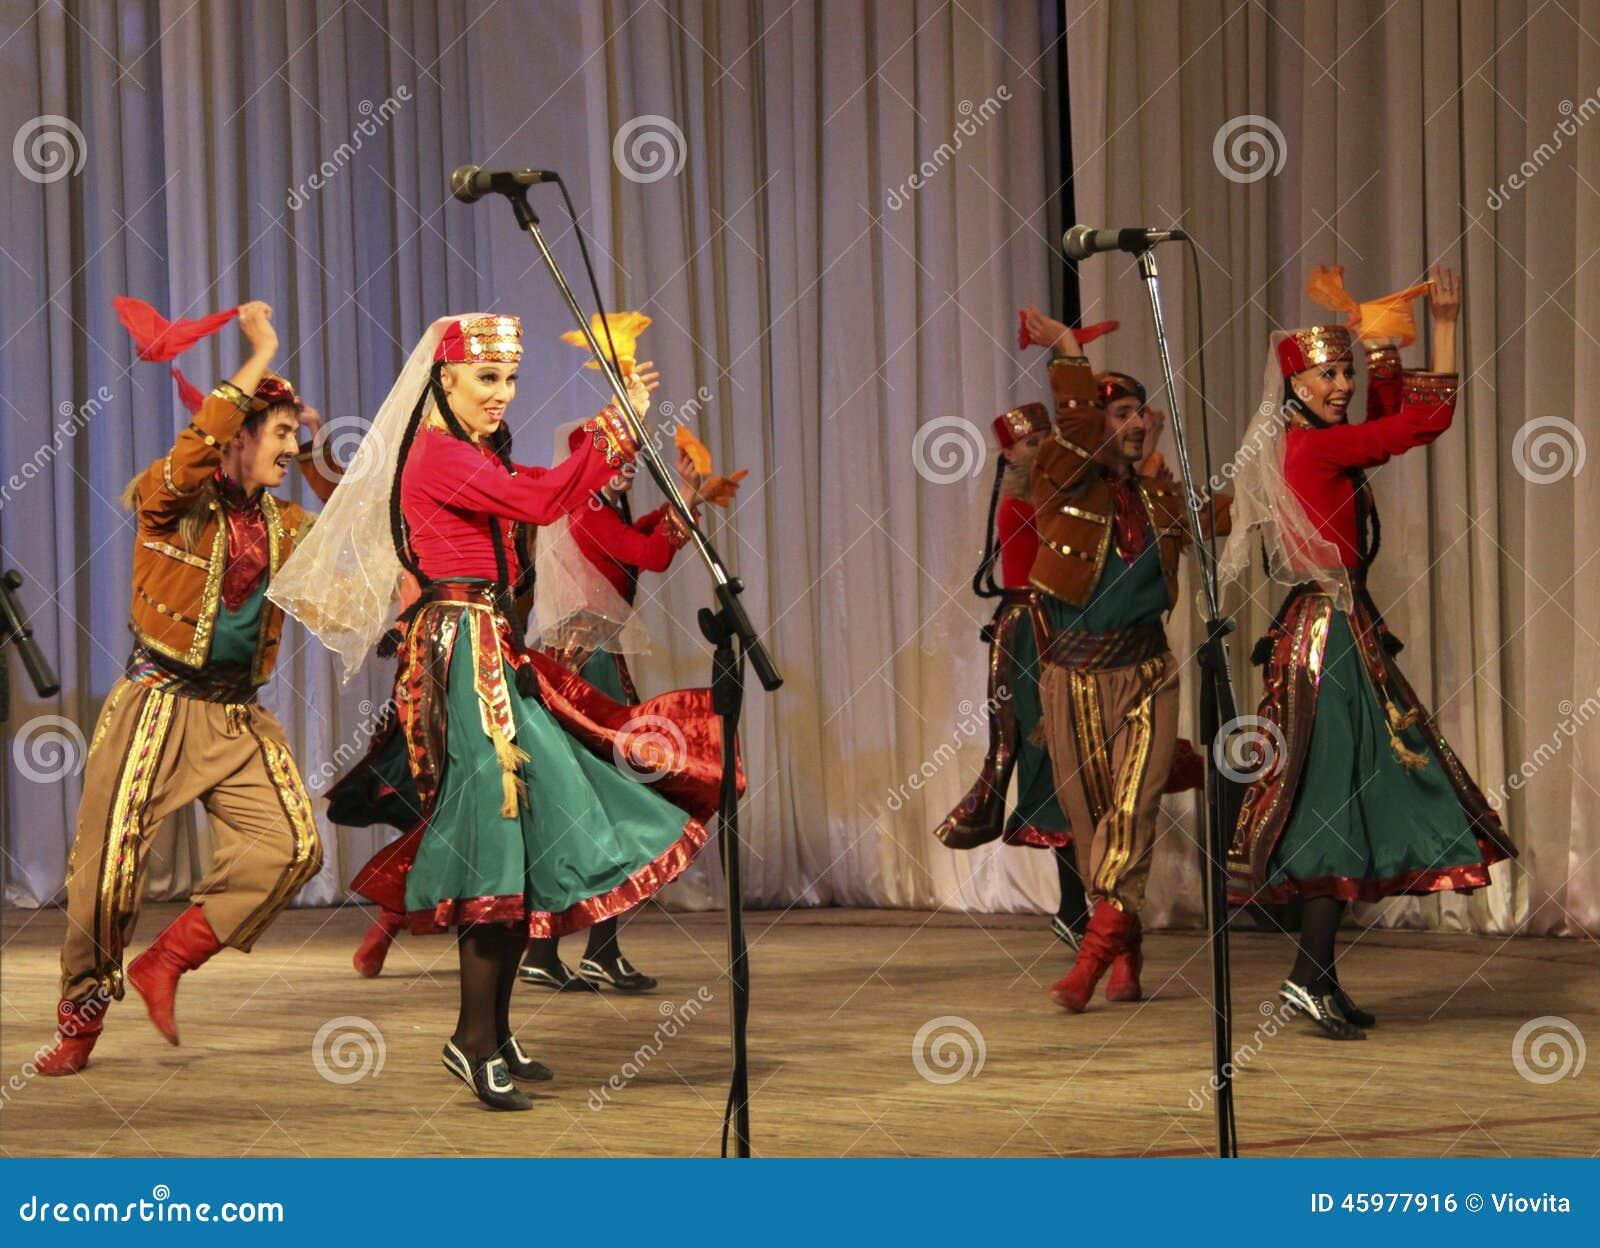 Grupo público Komenka Ethnic Dance and Music Ensemble ...